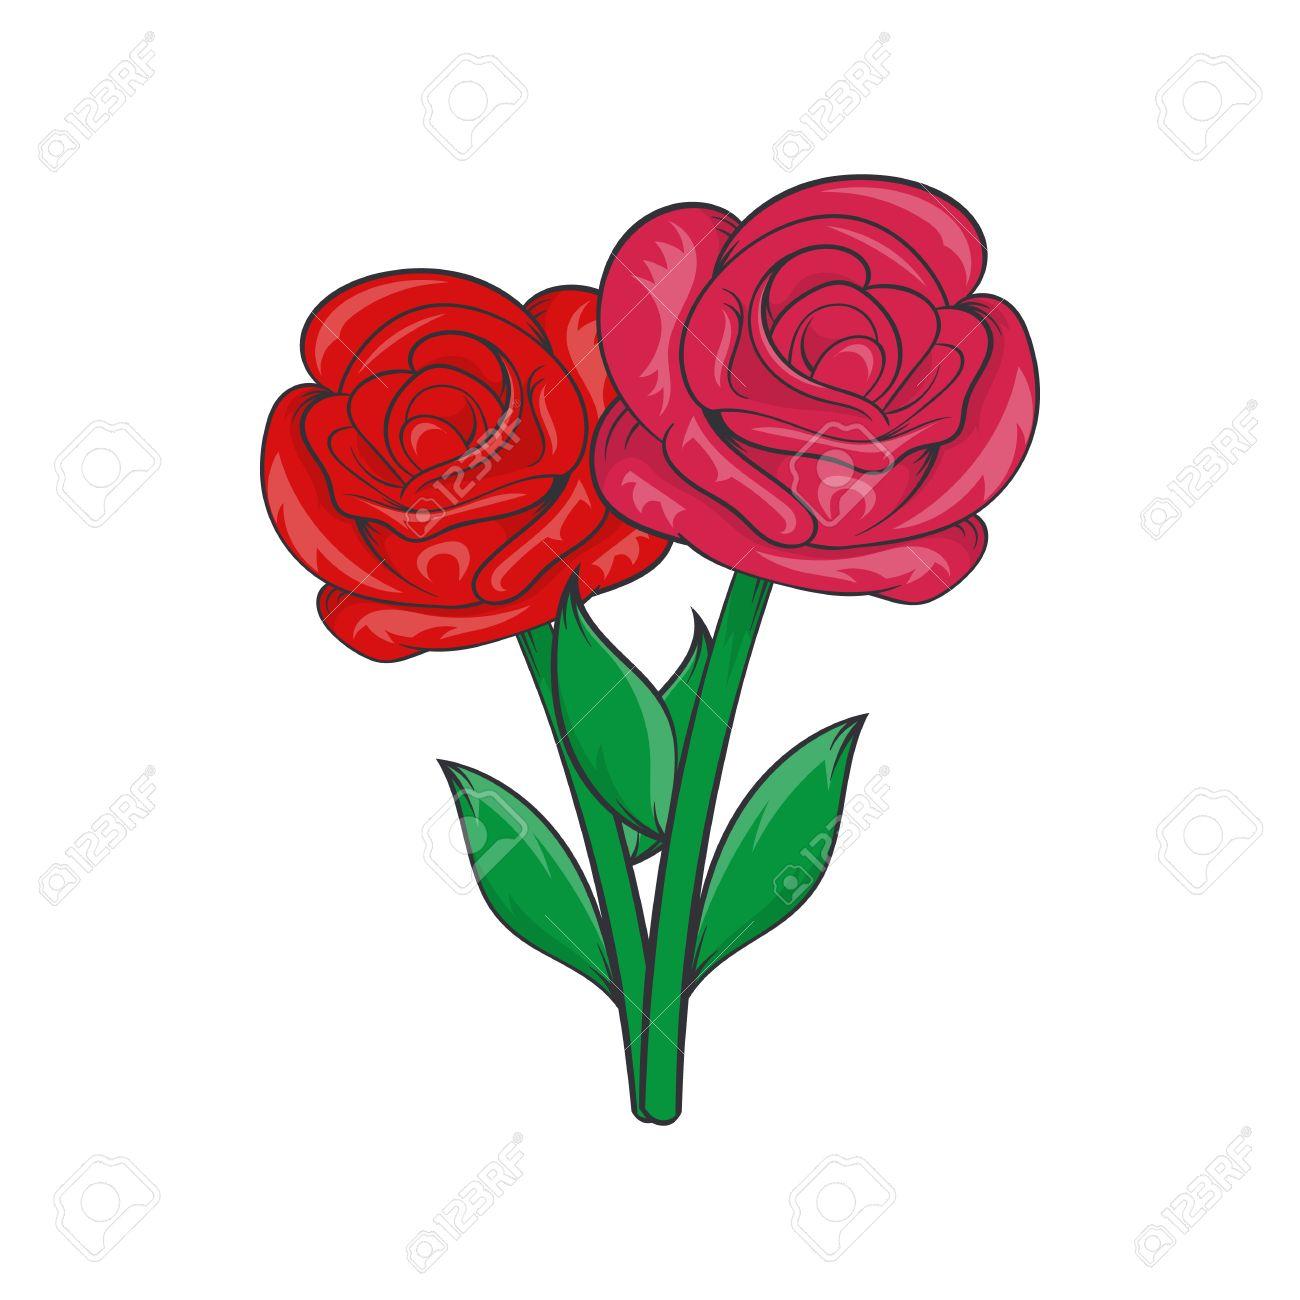 Flowers on grave icon in cartoon style isolated on white background flowers on grave icon in cartoon style isolated on white background death symbol stock vector mightylinksfo